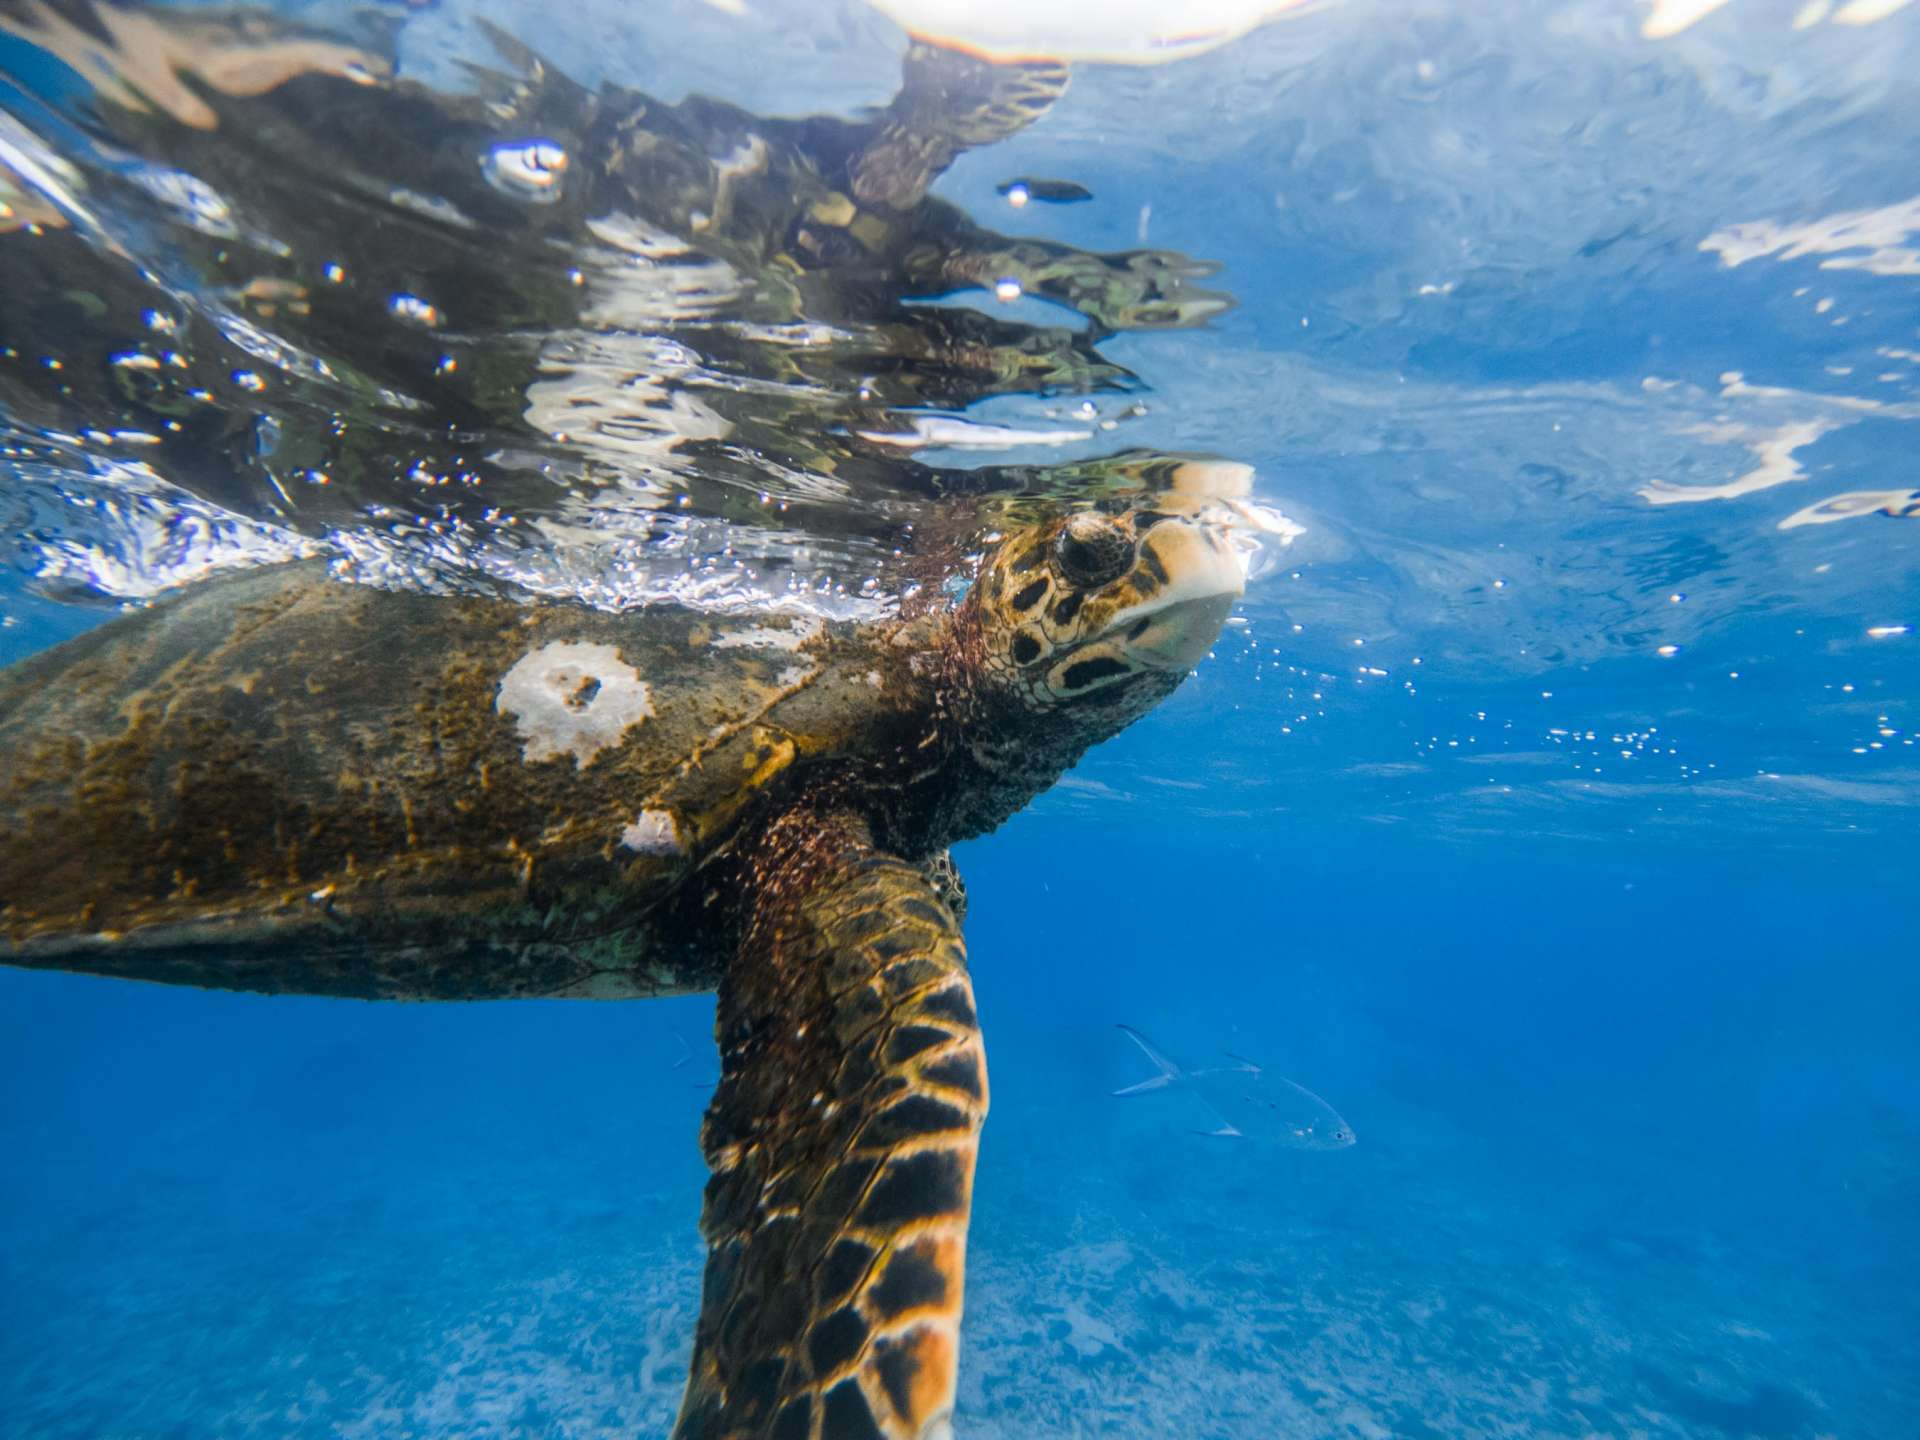 Snorkeling at St Pierre Island, Praslin Seychelles travel photography underwater snorkeling enrico pescantini